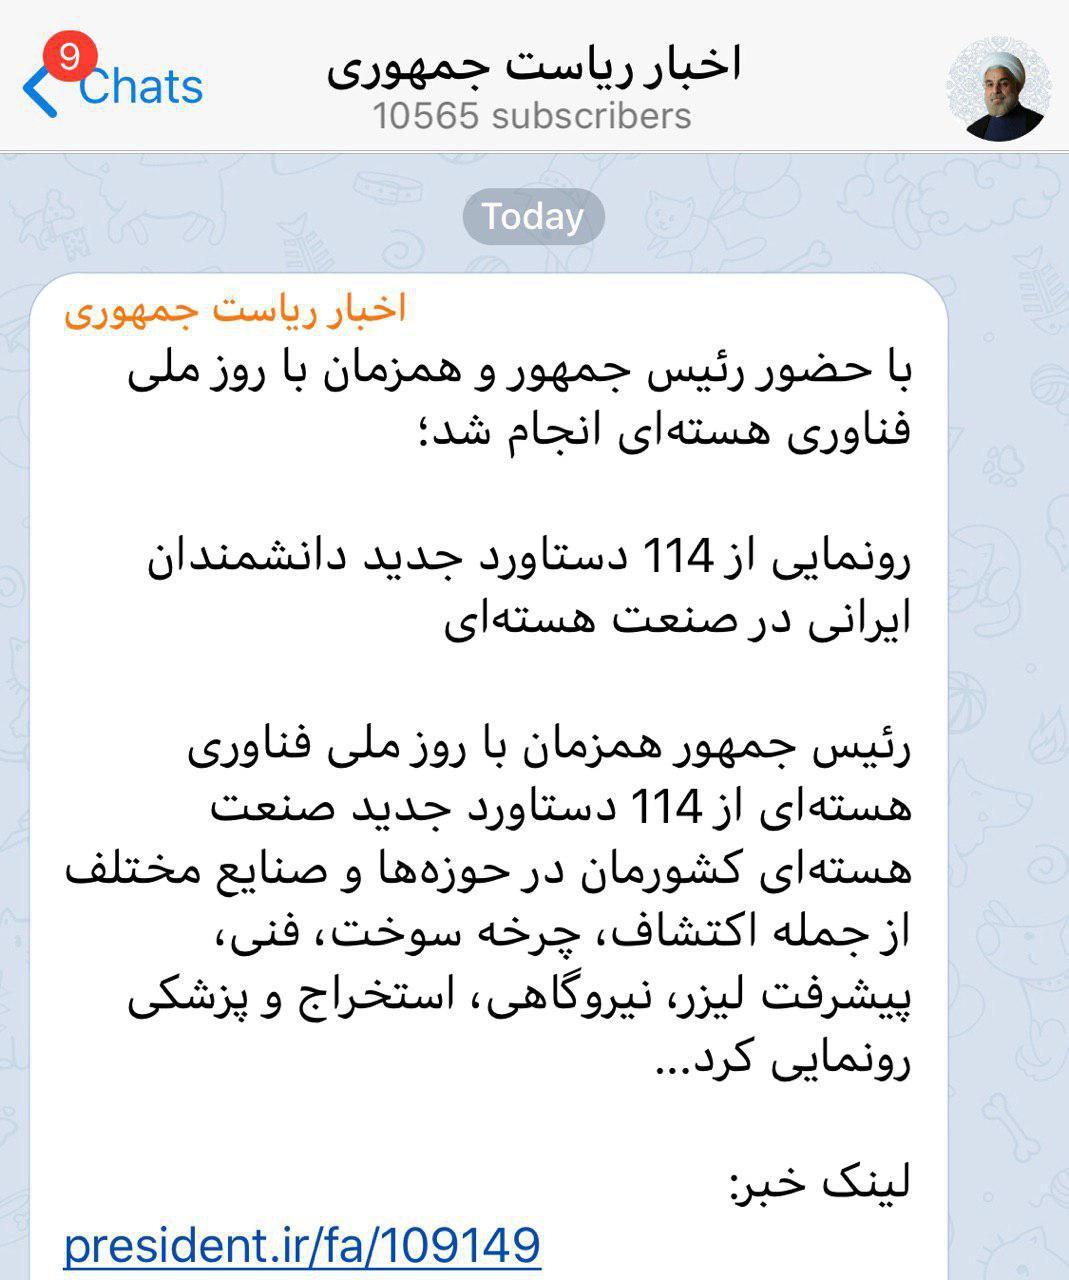 روحانی هم به تلگرام بازگشت!